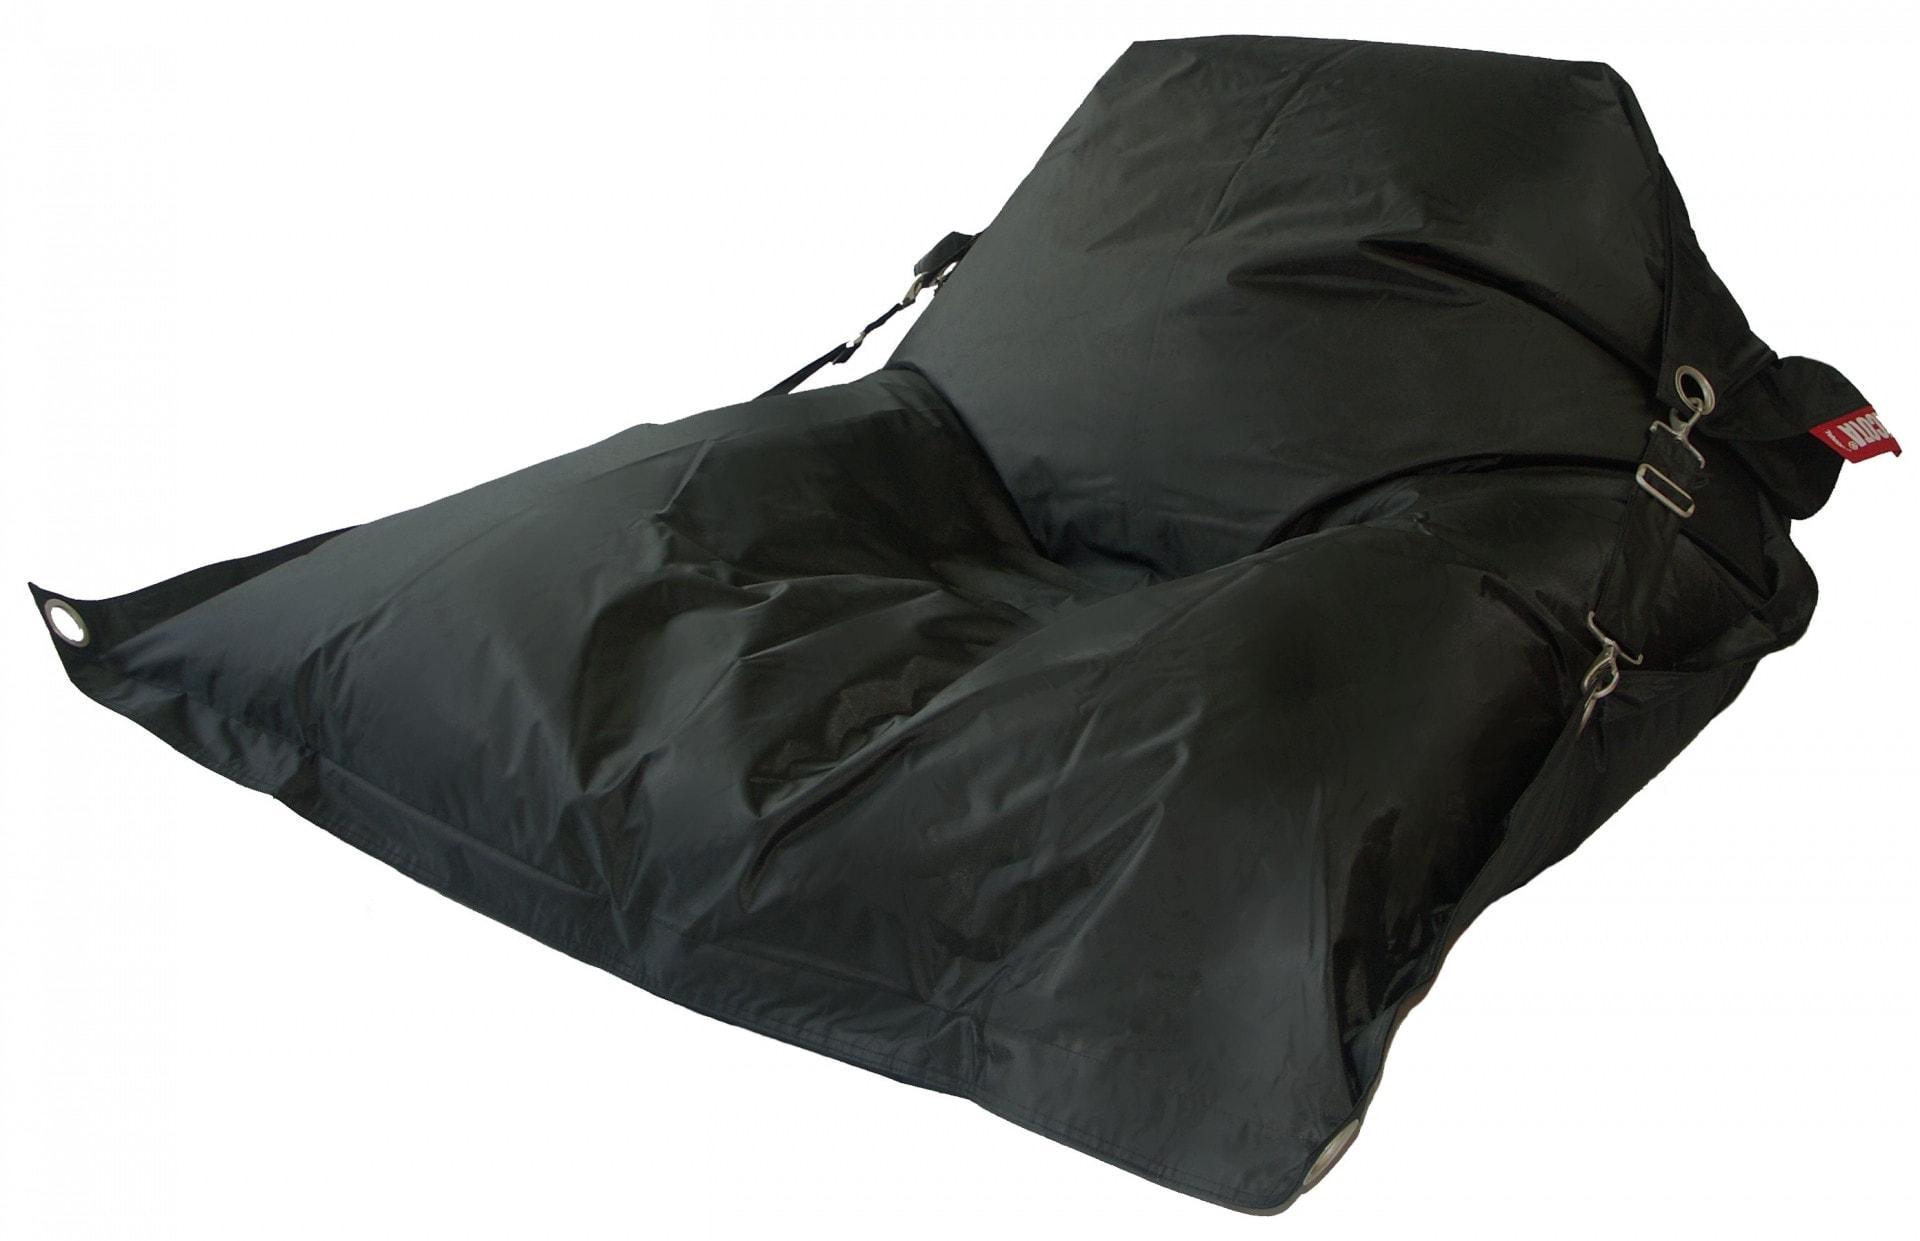 Sedací Vak Dacota Relax - černý